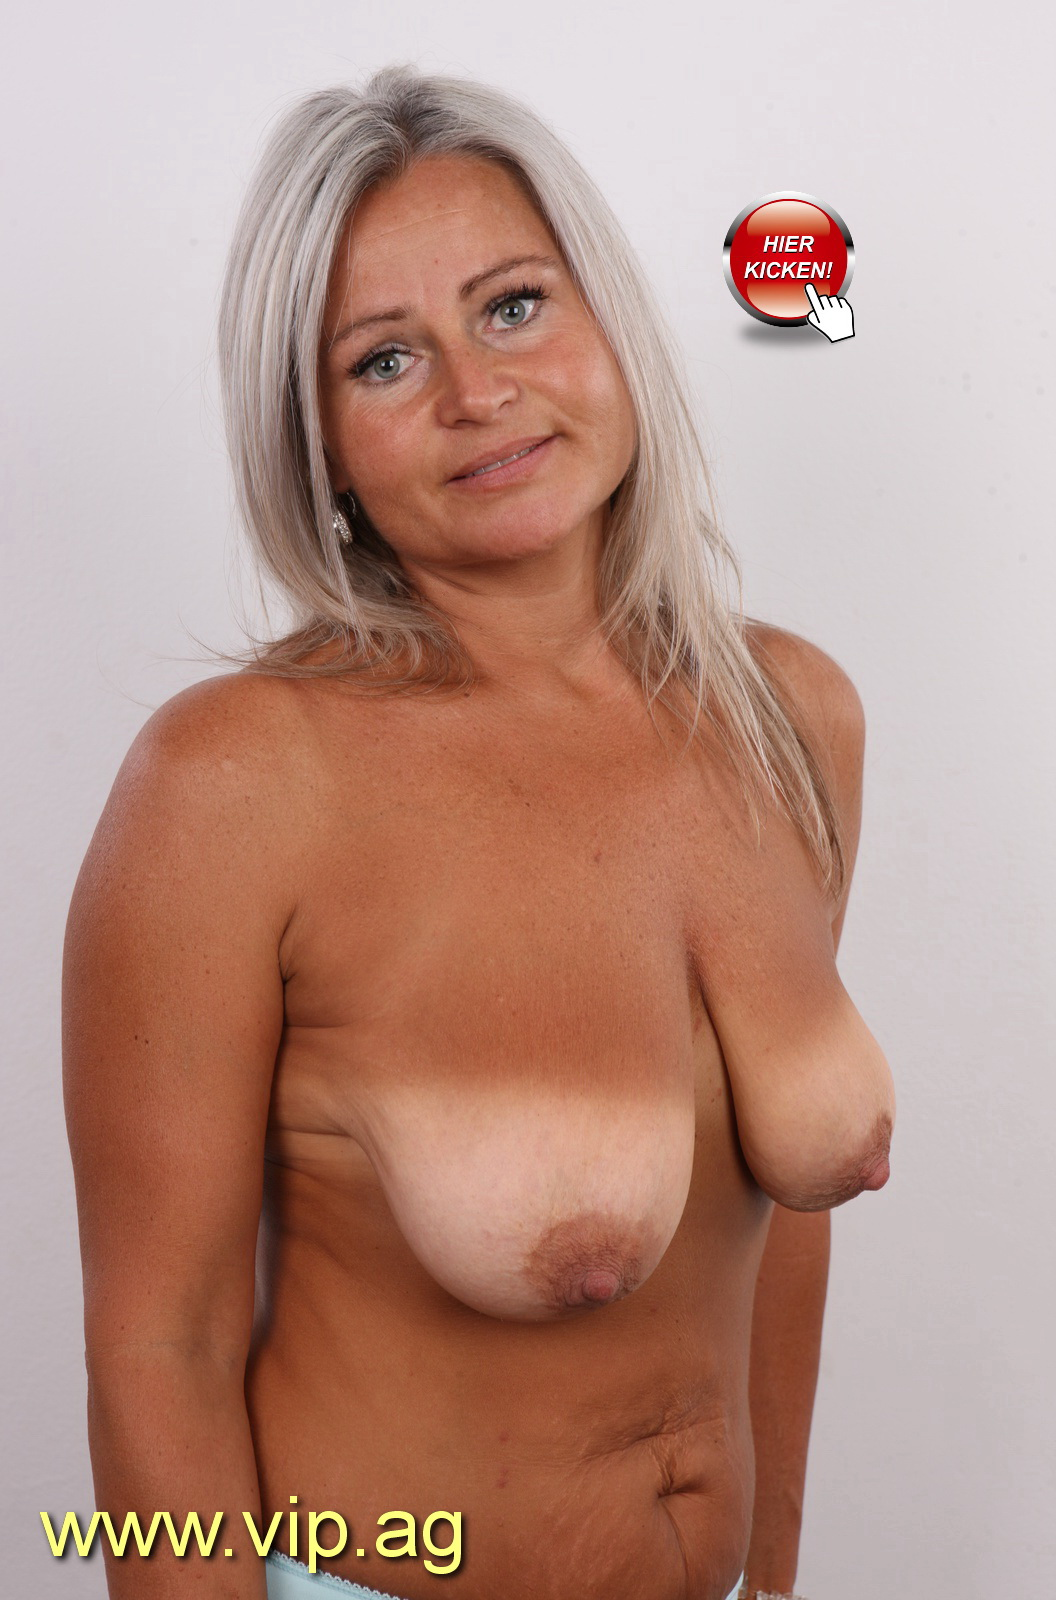 große Titten Nicole